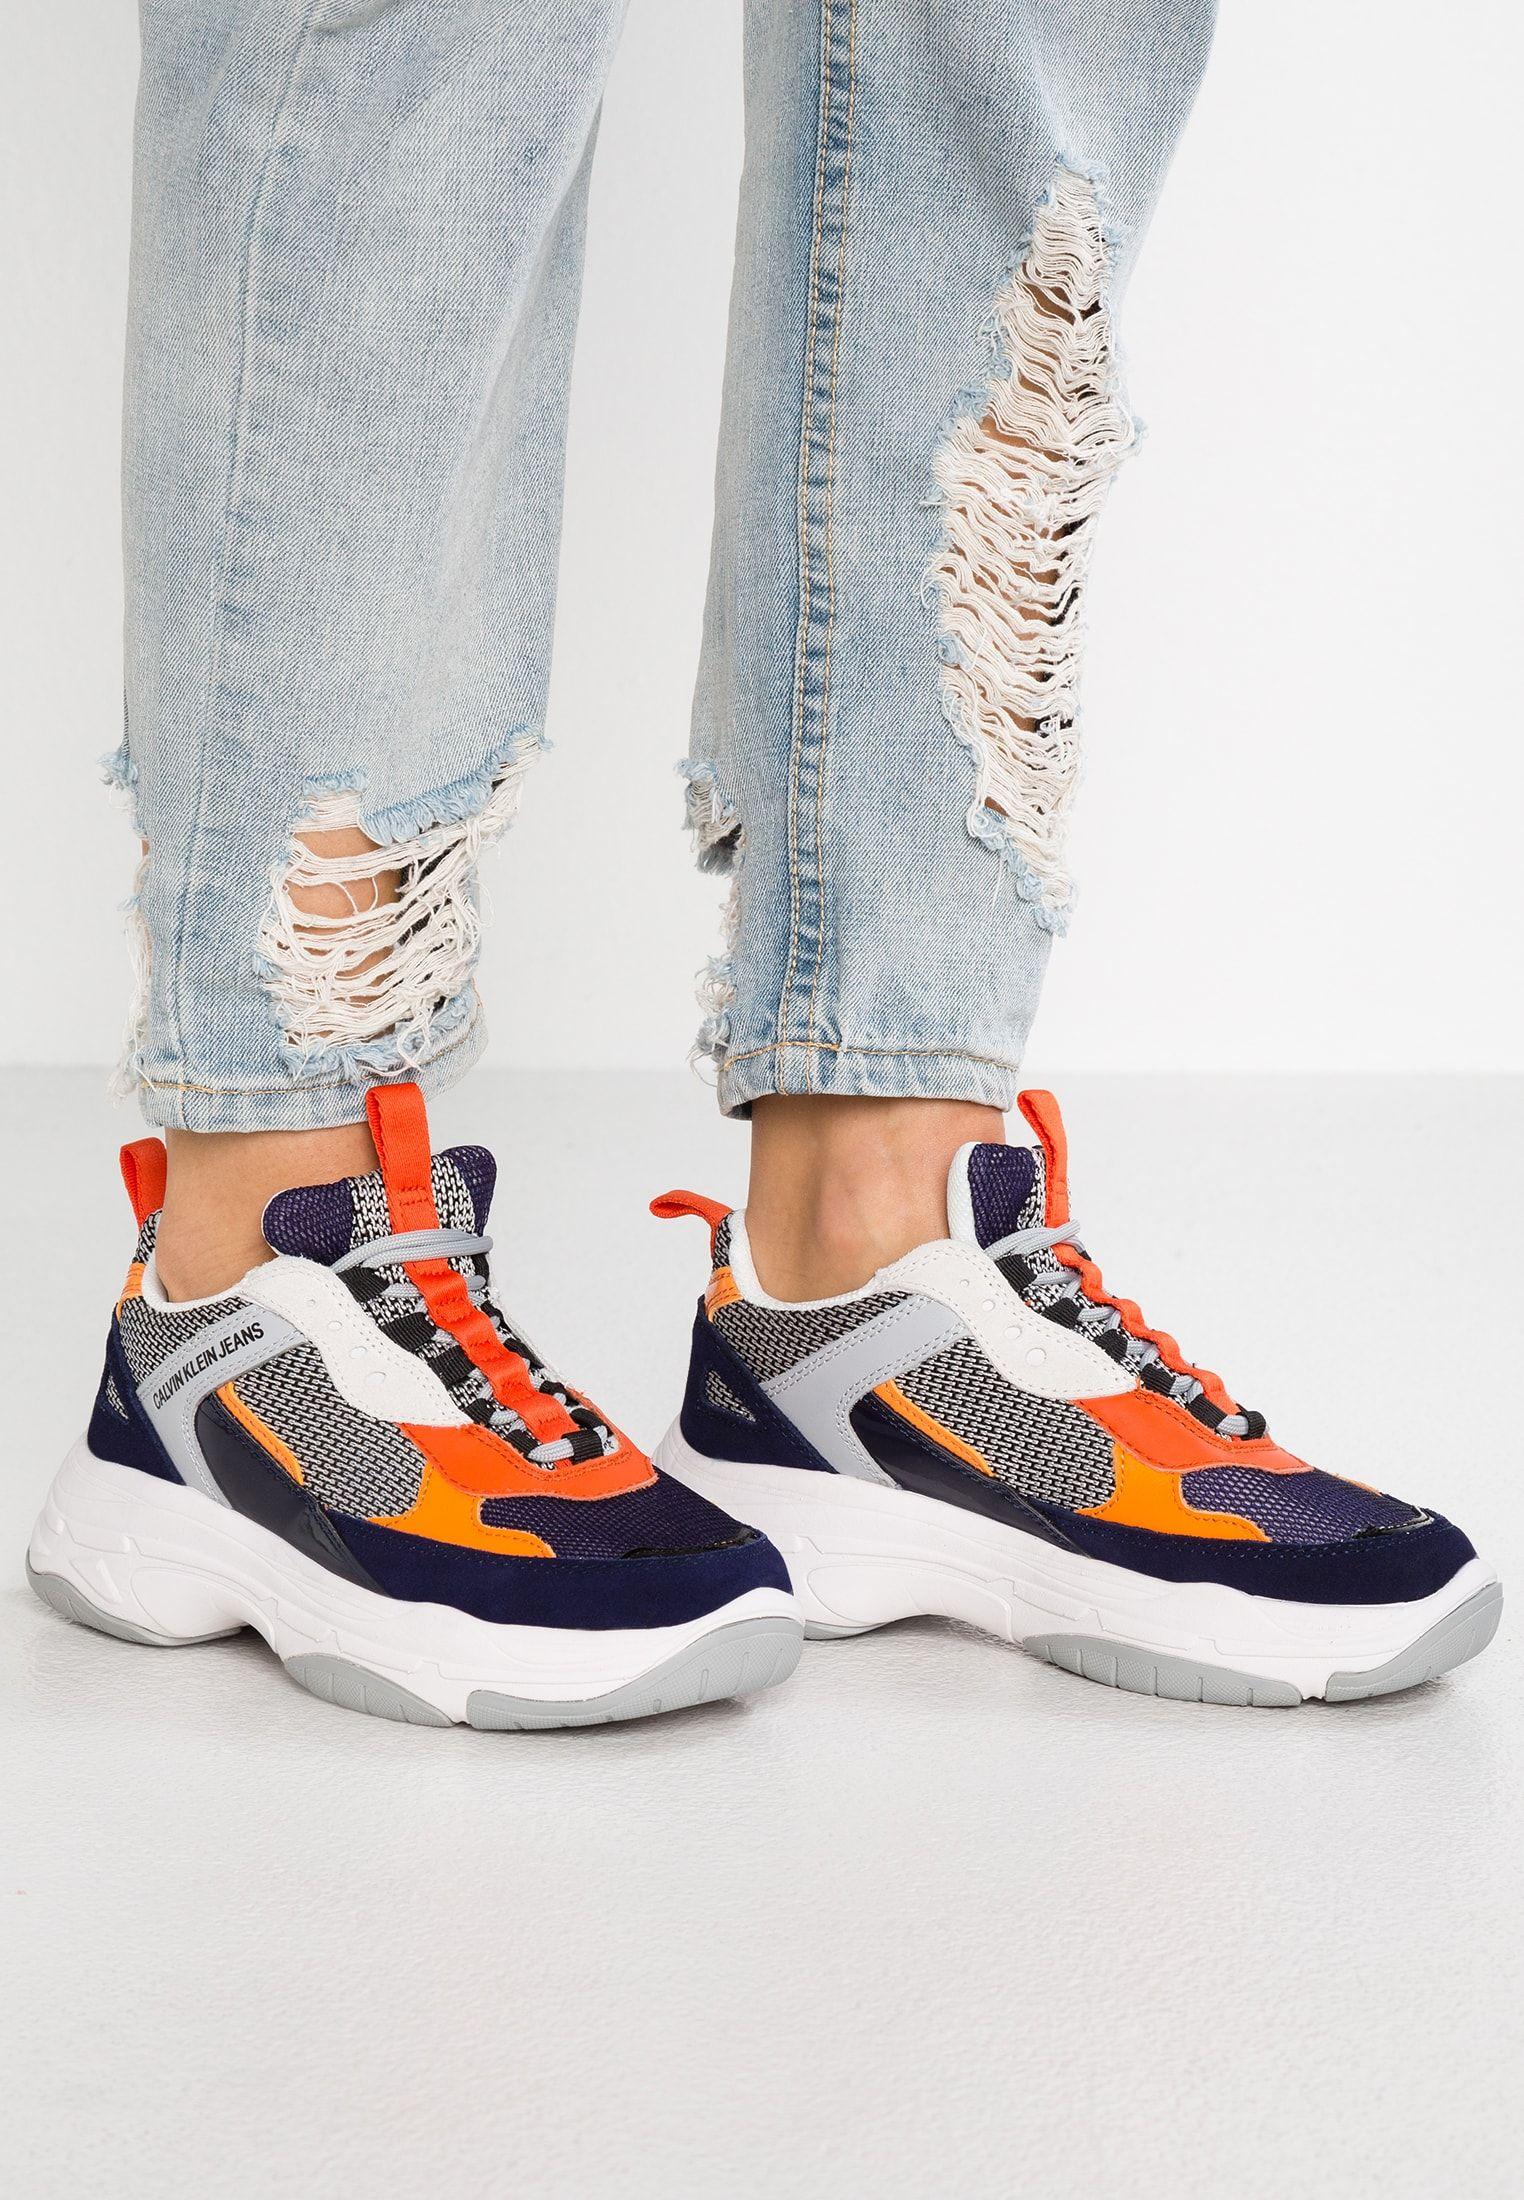 MAYA Sneakers laag navylight greyorange @ Zalando.nl